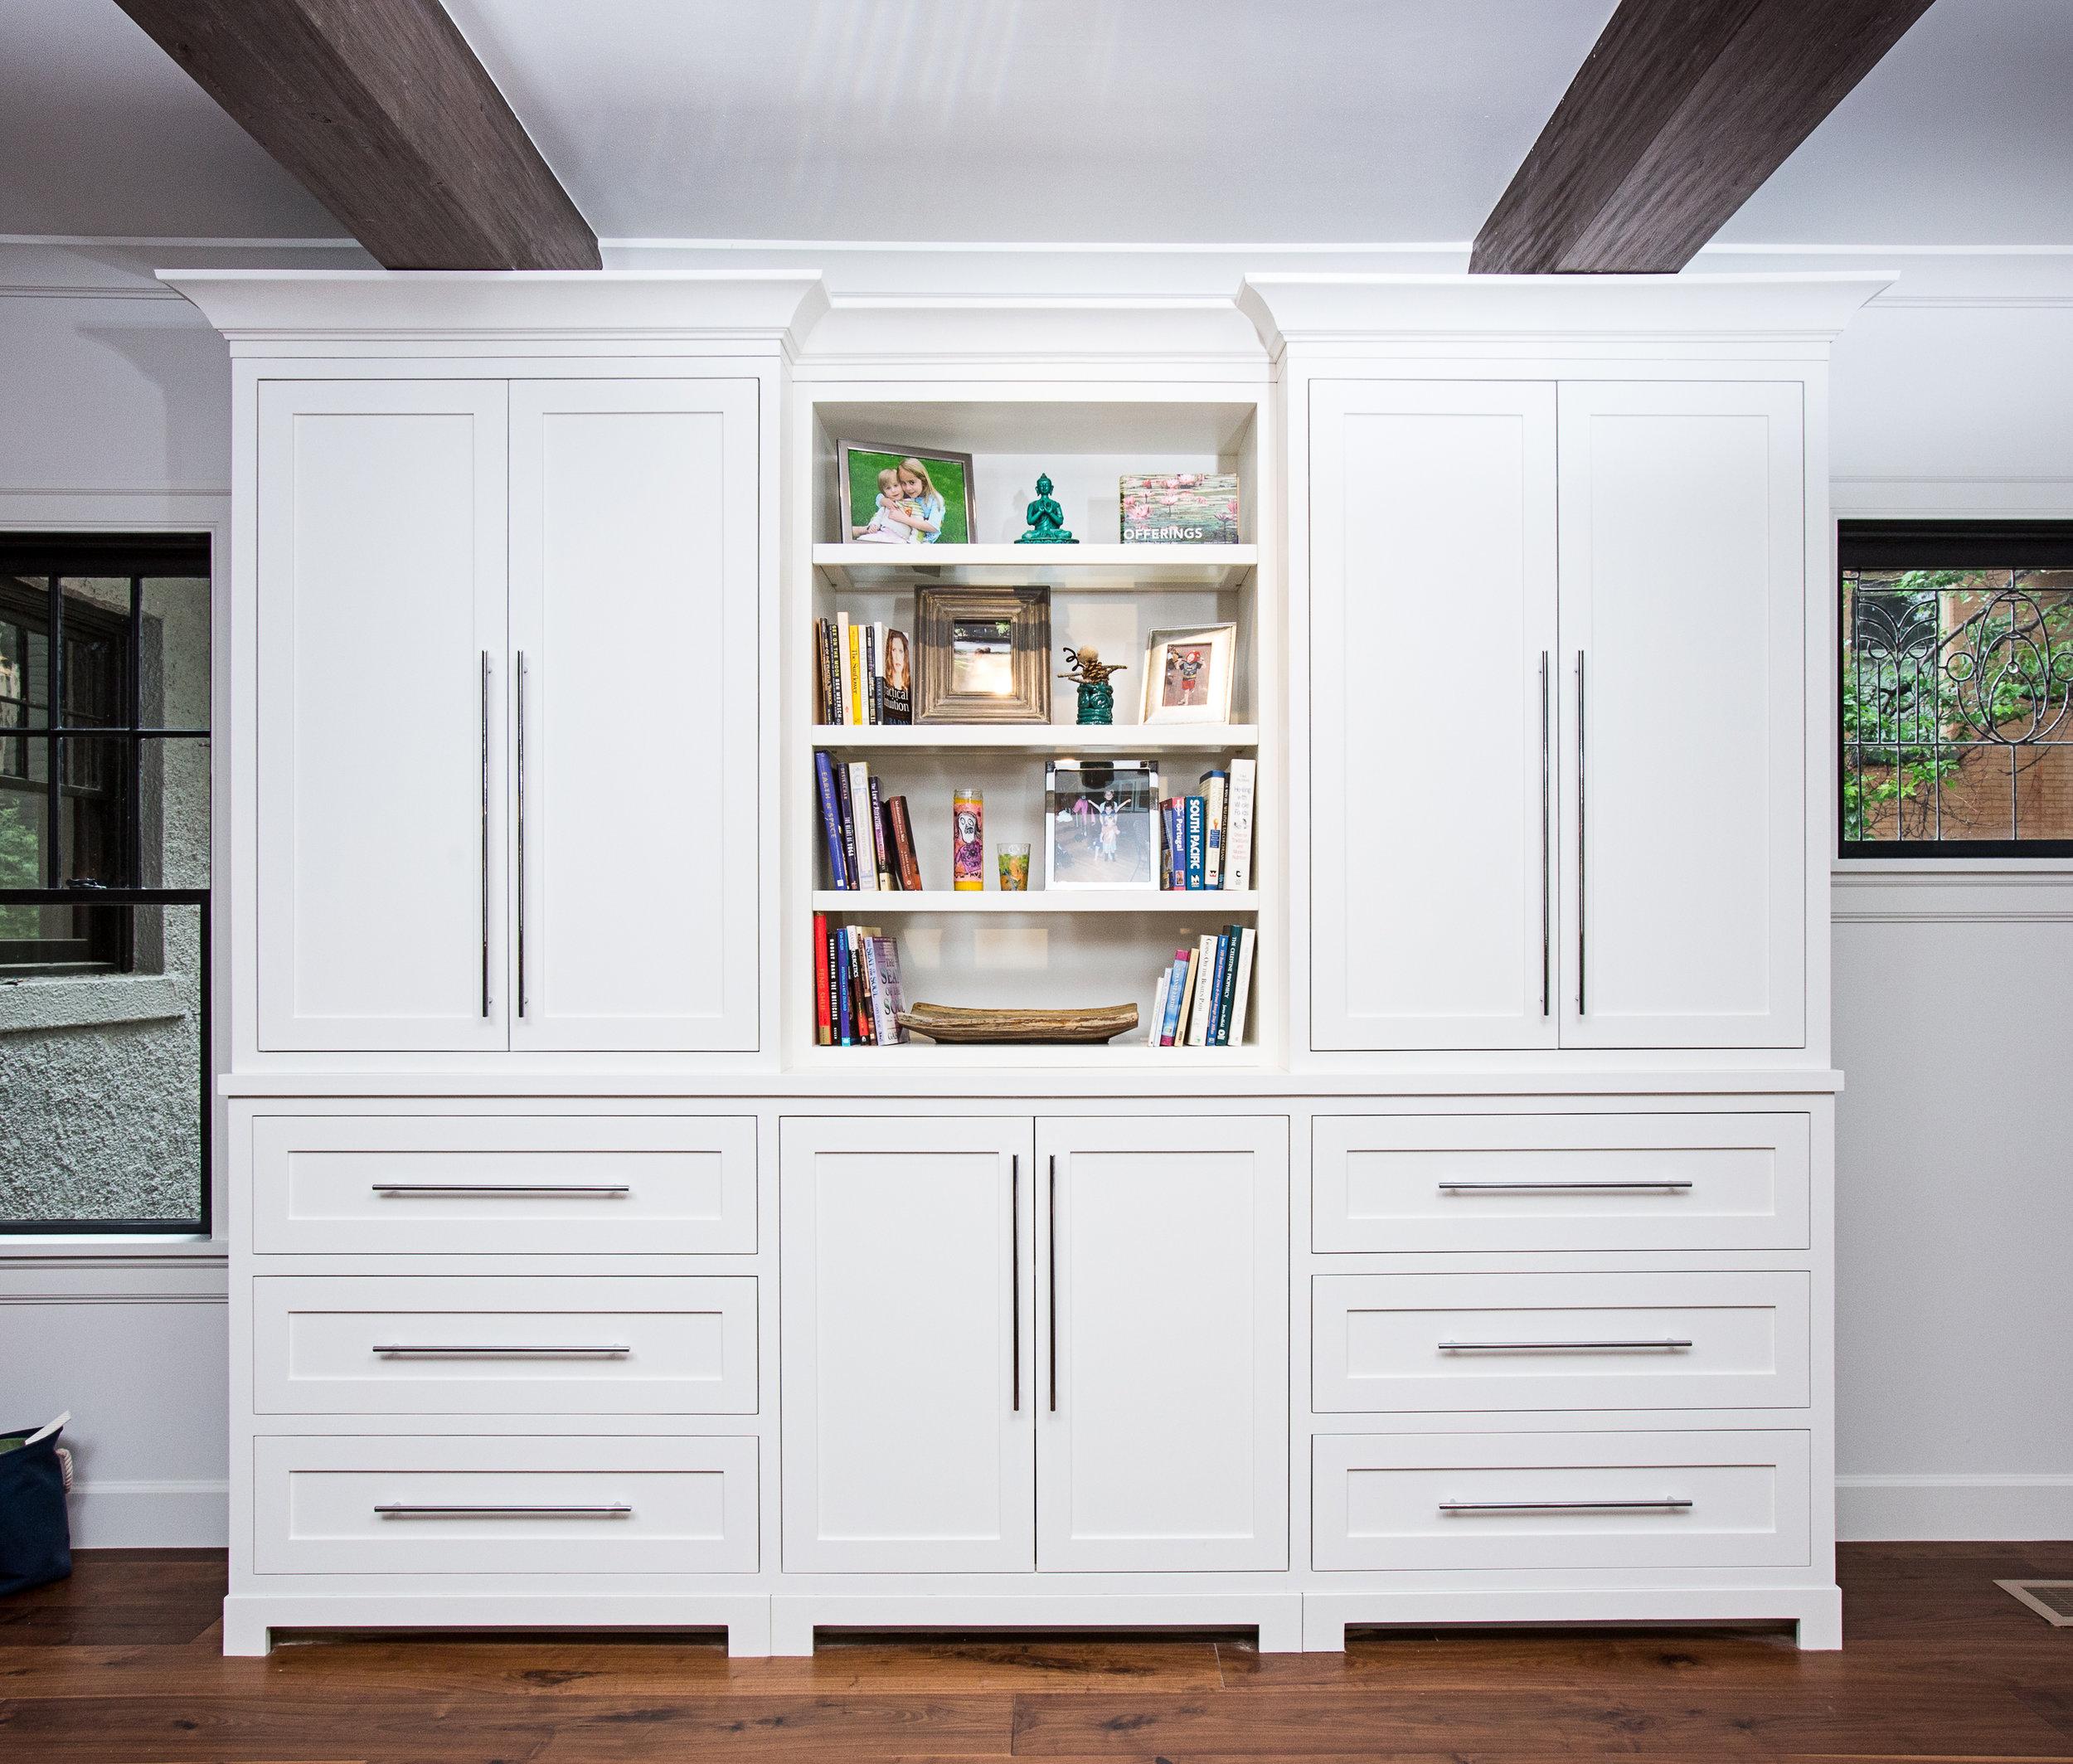 cabinetry 6.jpg